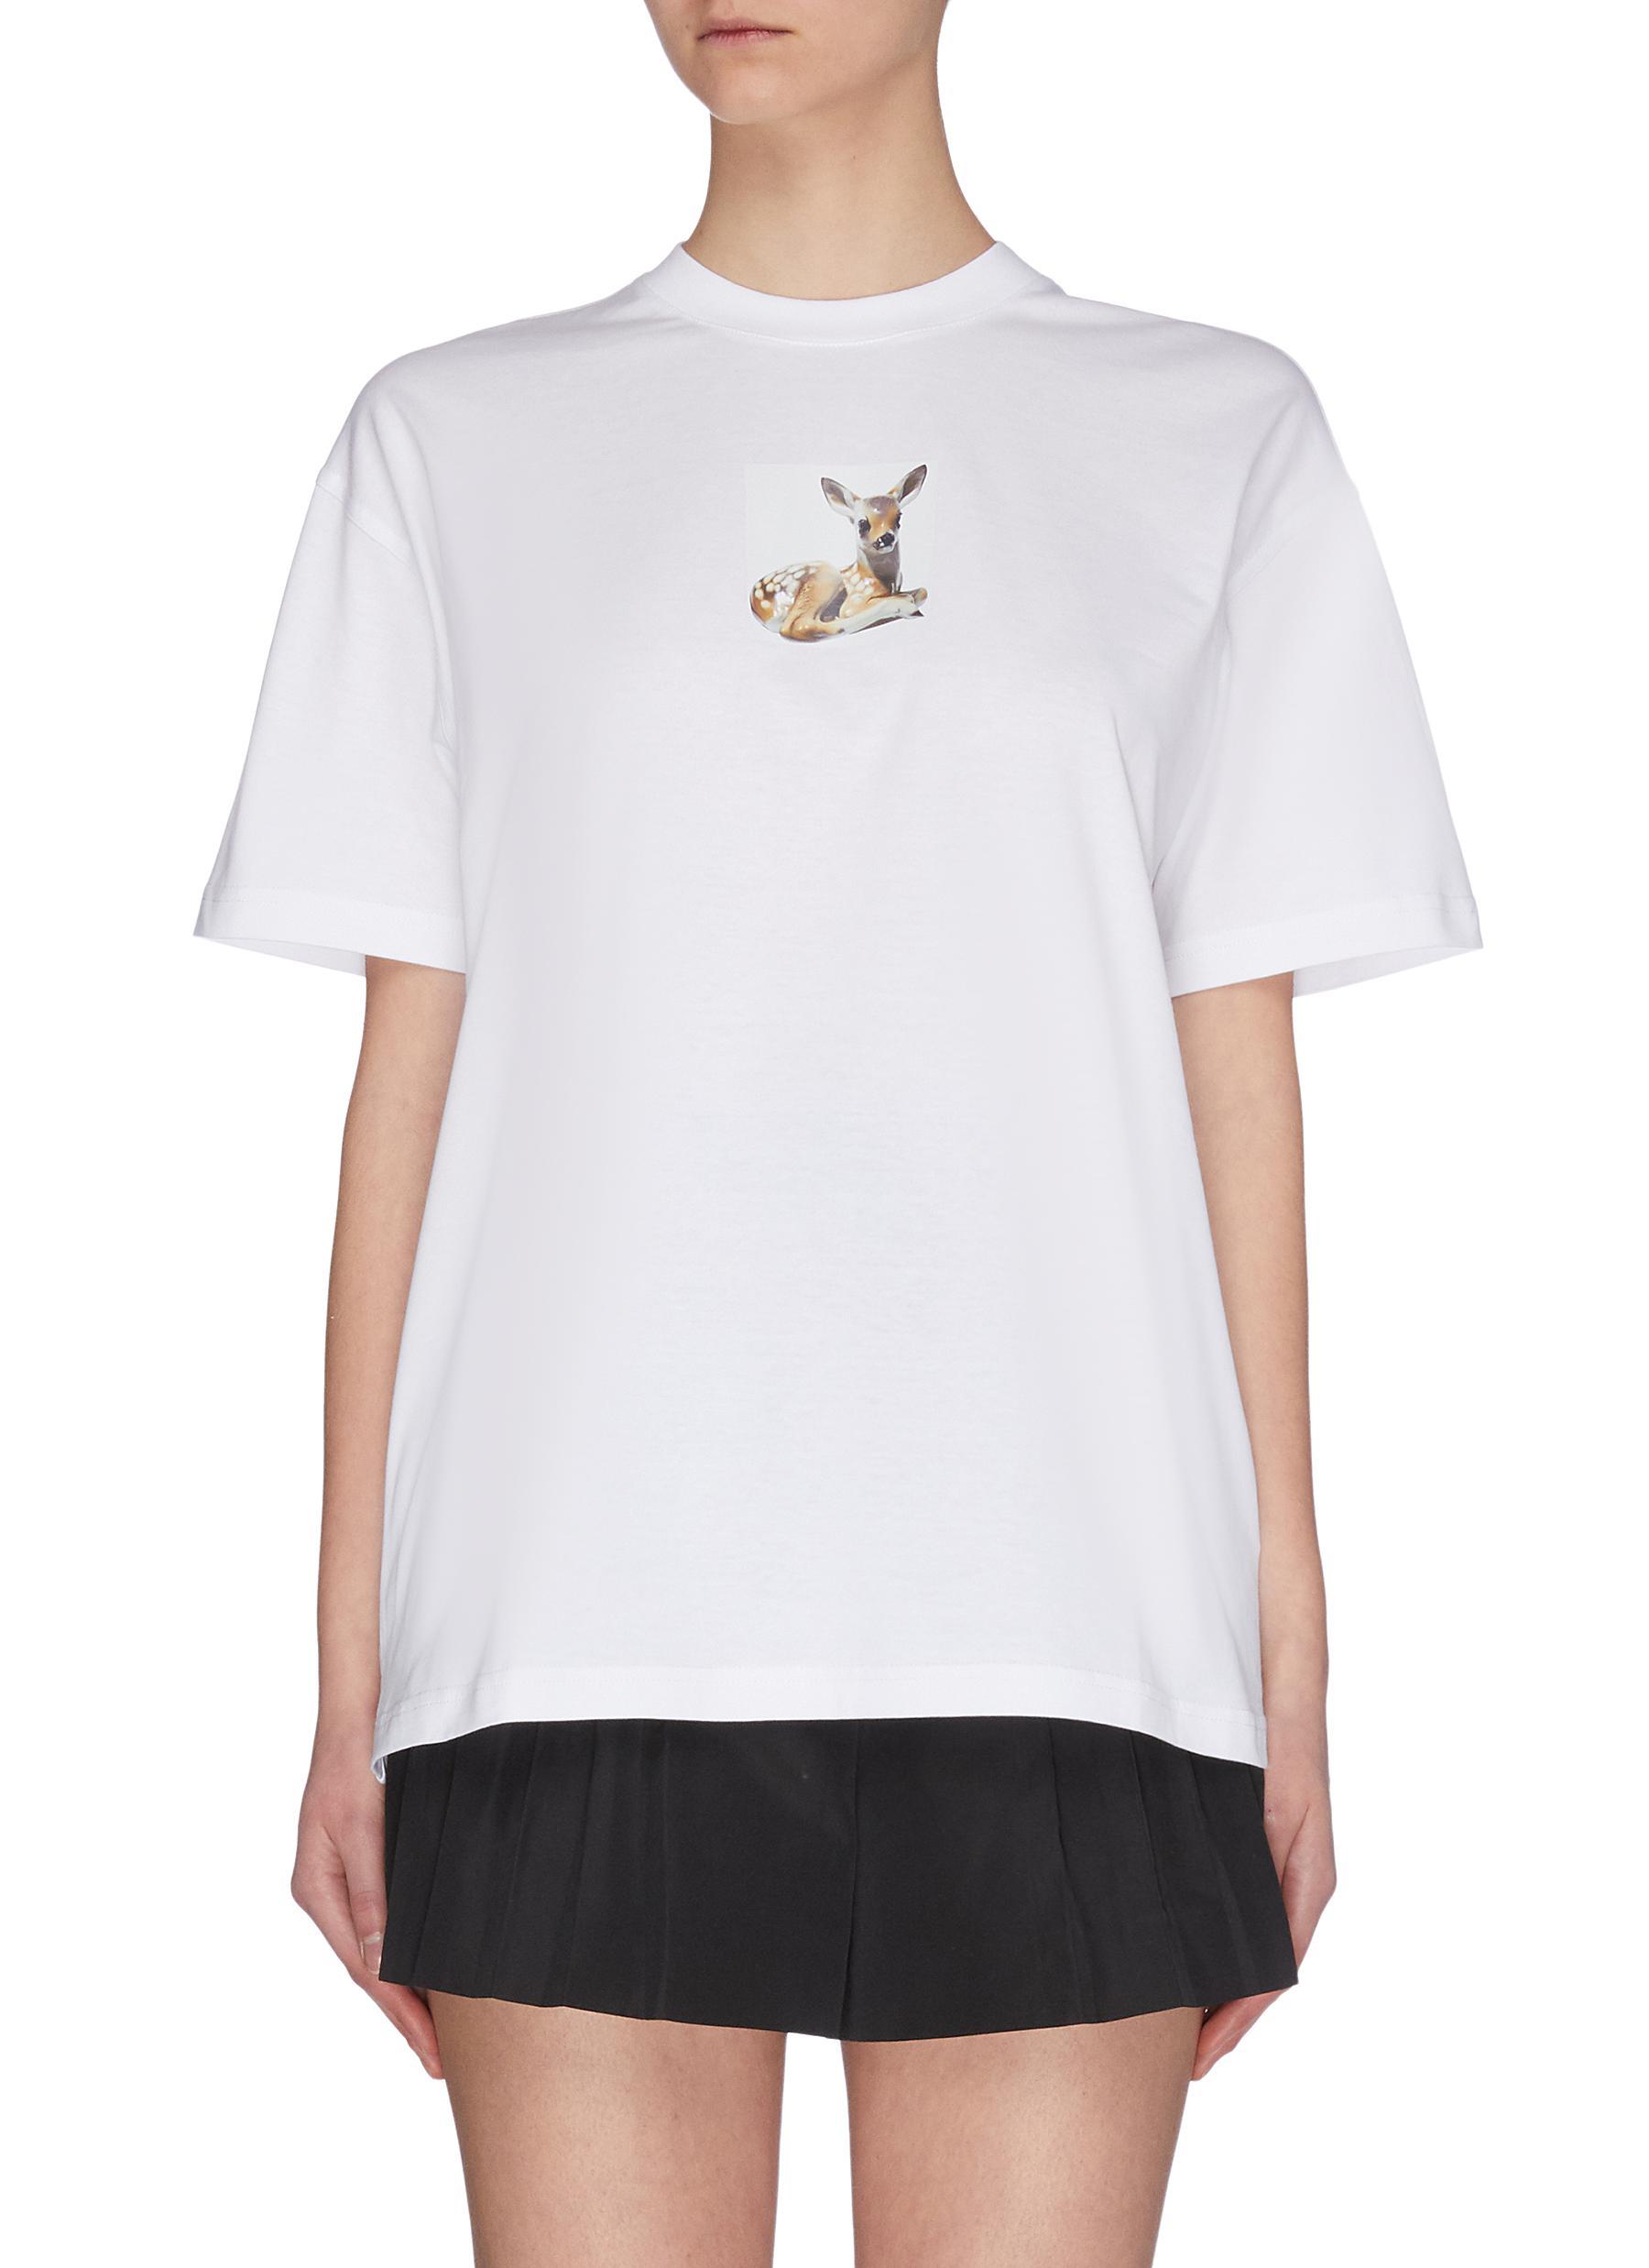 Buy Burberry Tops 'Bambi' graphic print T-shirt